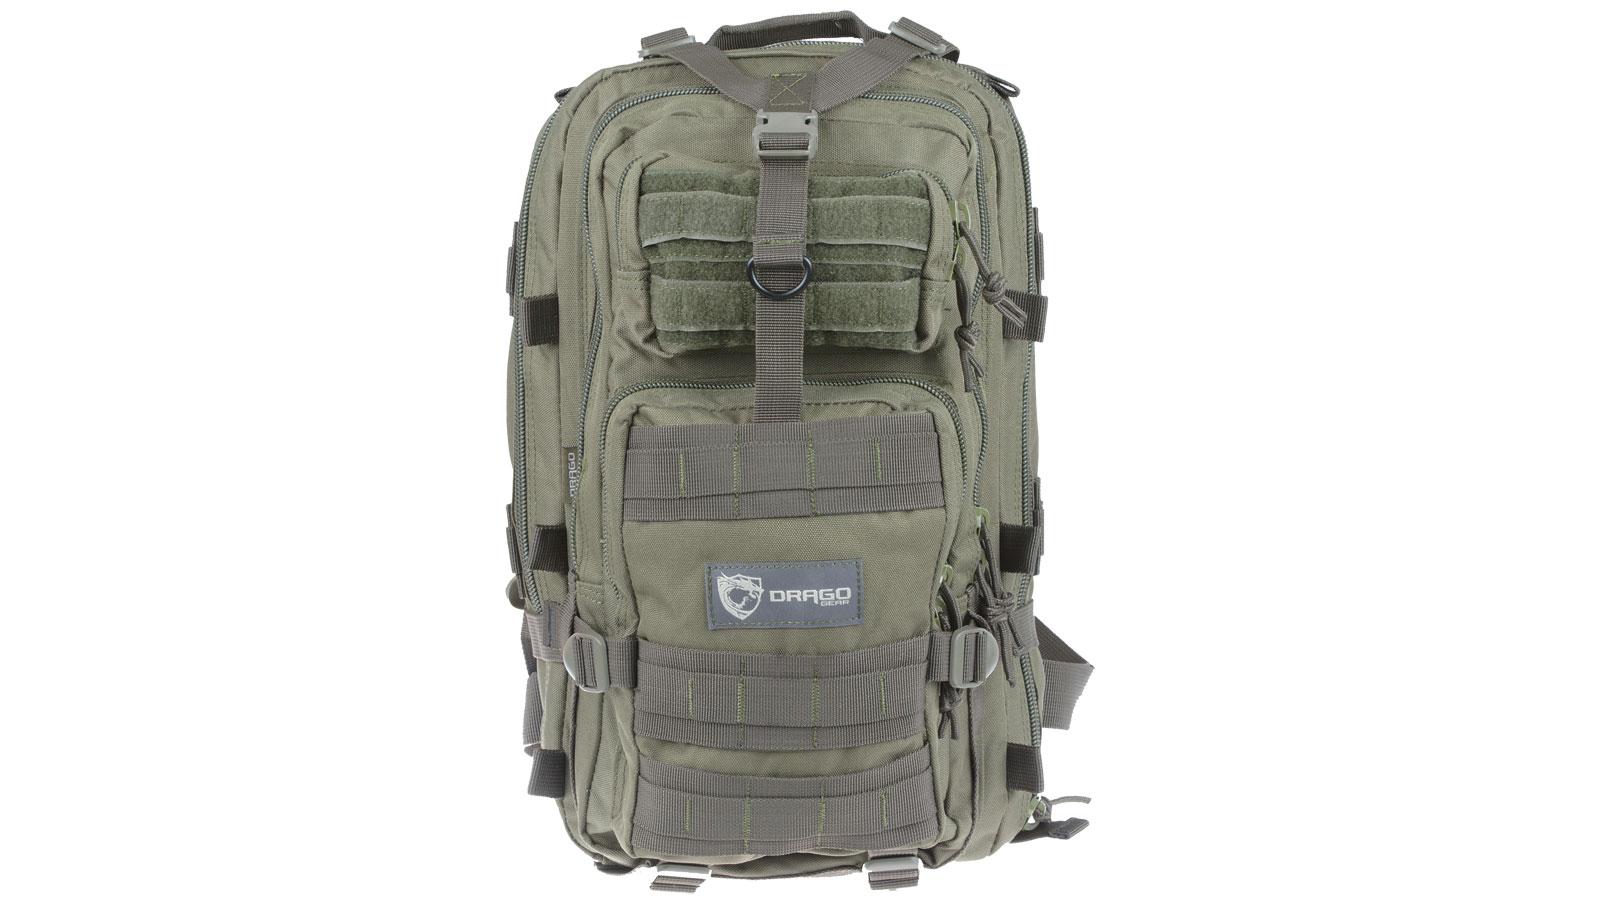 Drago Gear 14301GR Tracker Backpack 600D Polyester 18 x 11 in.  x 11 in.  Green in.